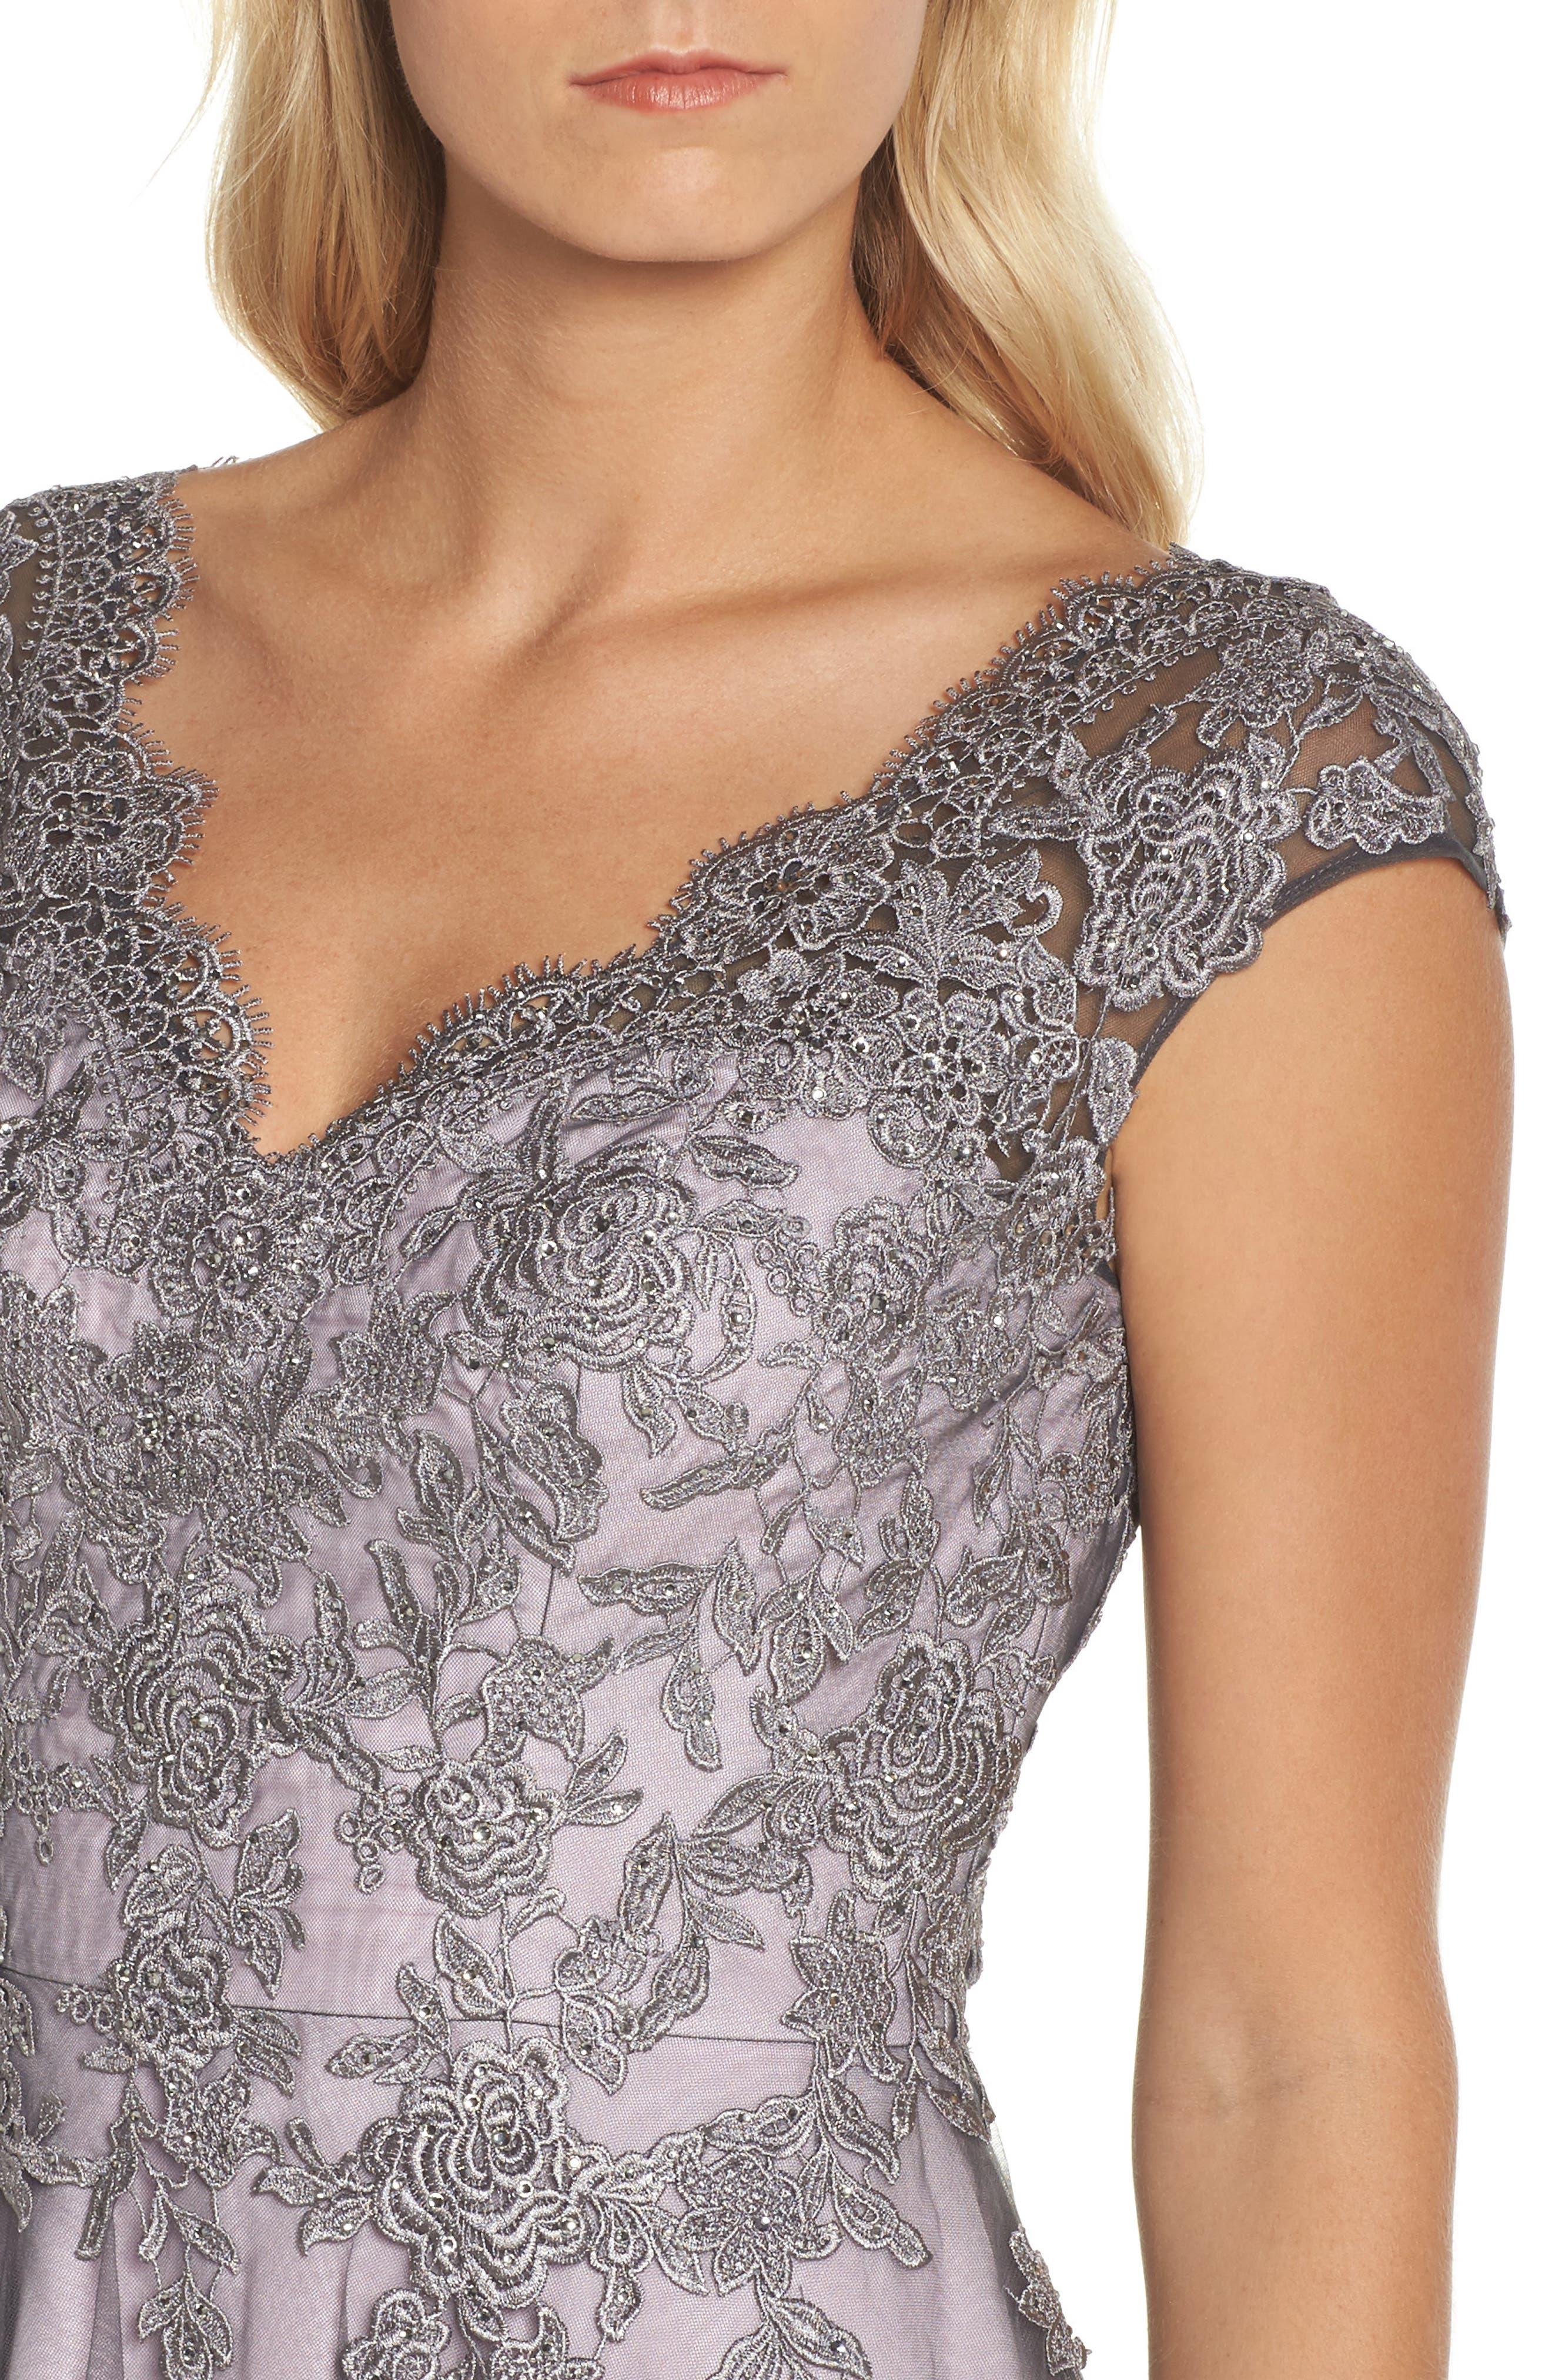 LA FEMME, Embellished Mesh A-Line Gown, Alternate thumbnail 4, color, PINK/ GRAY